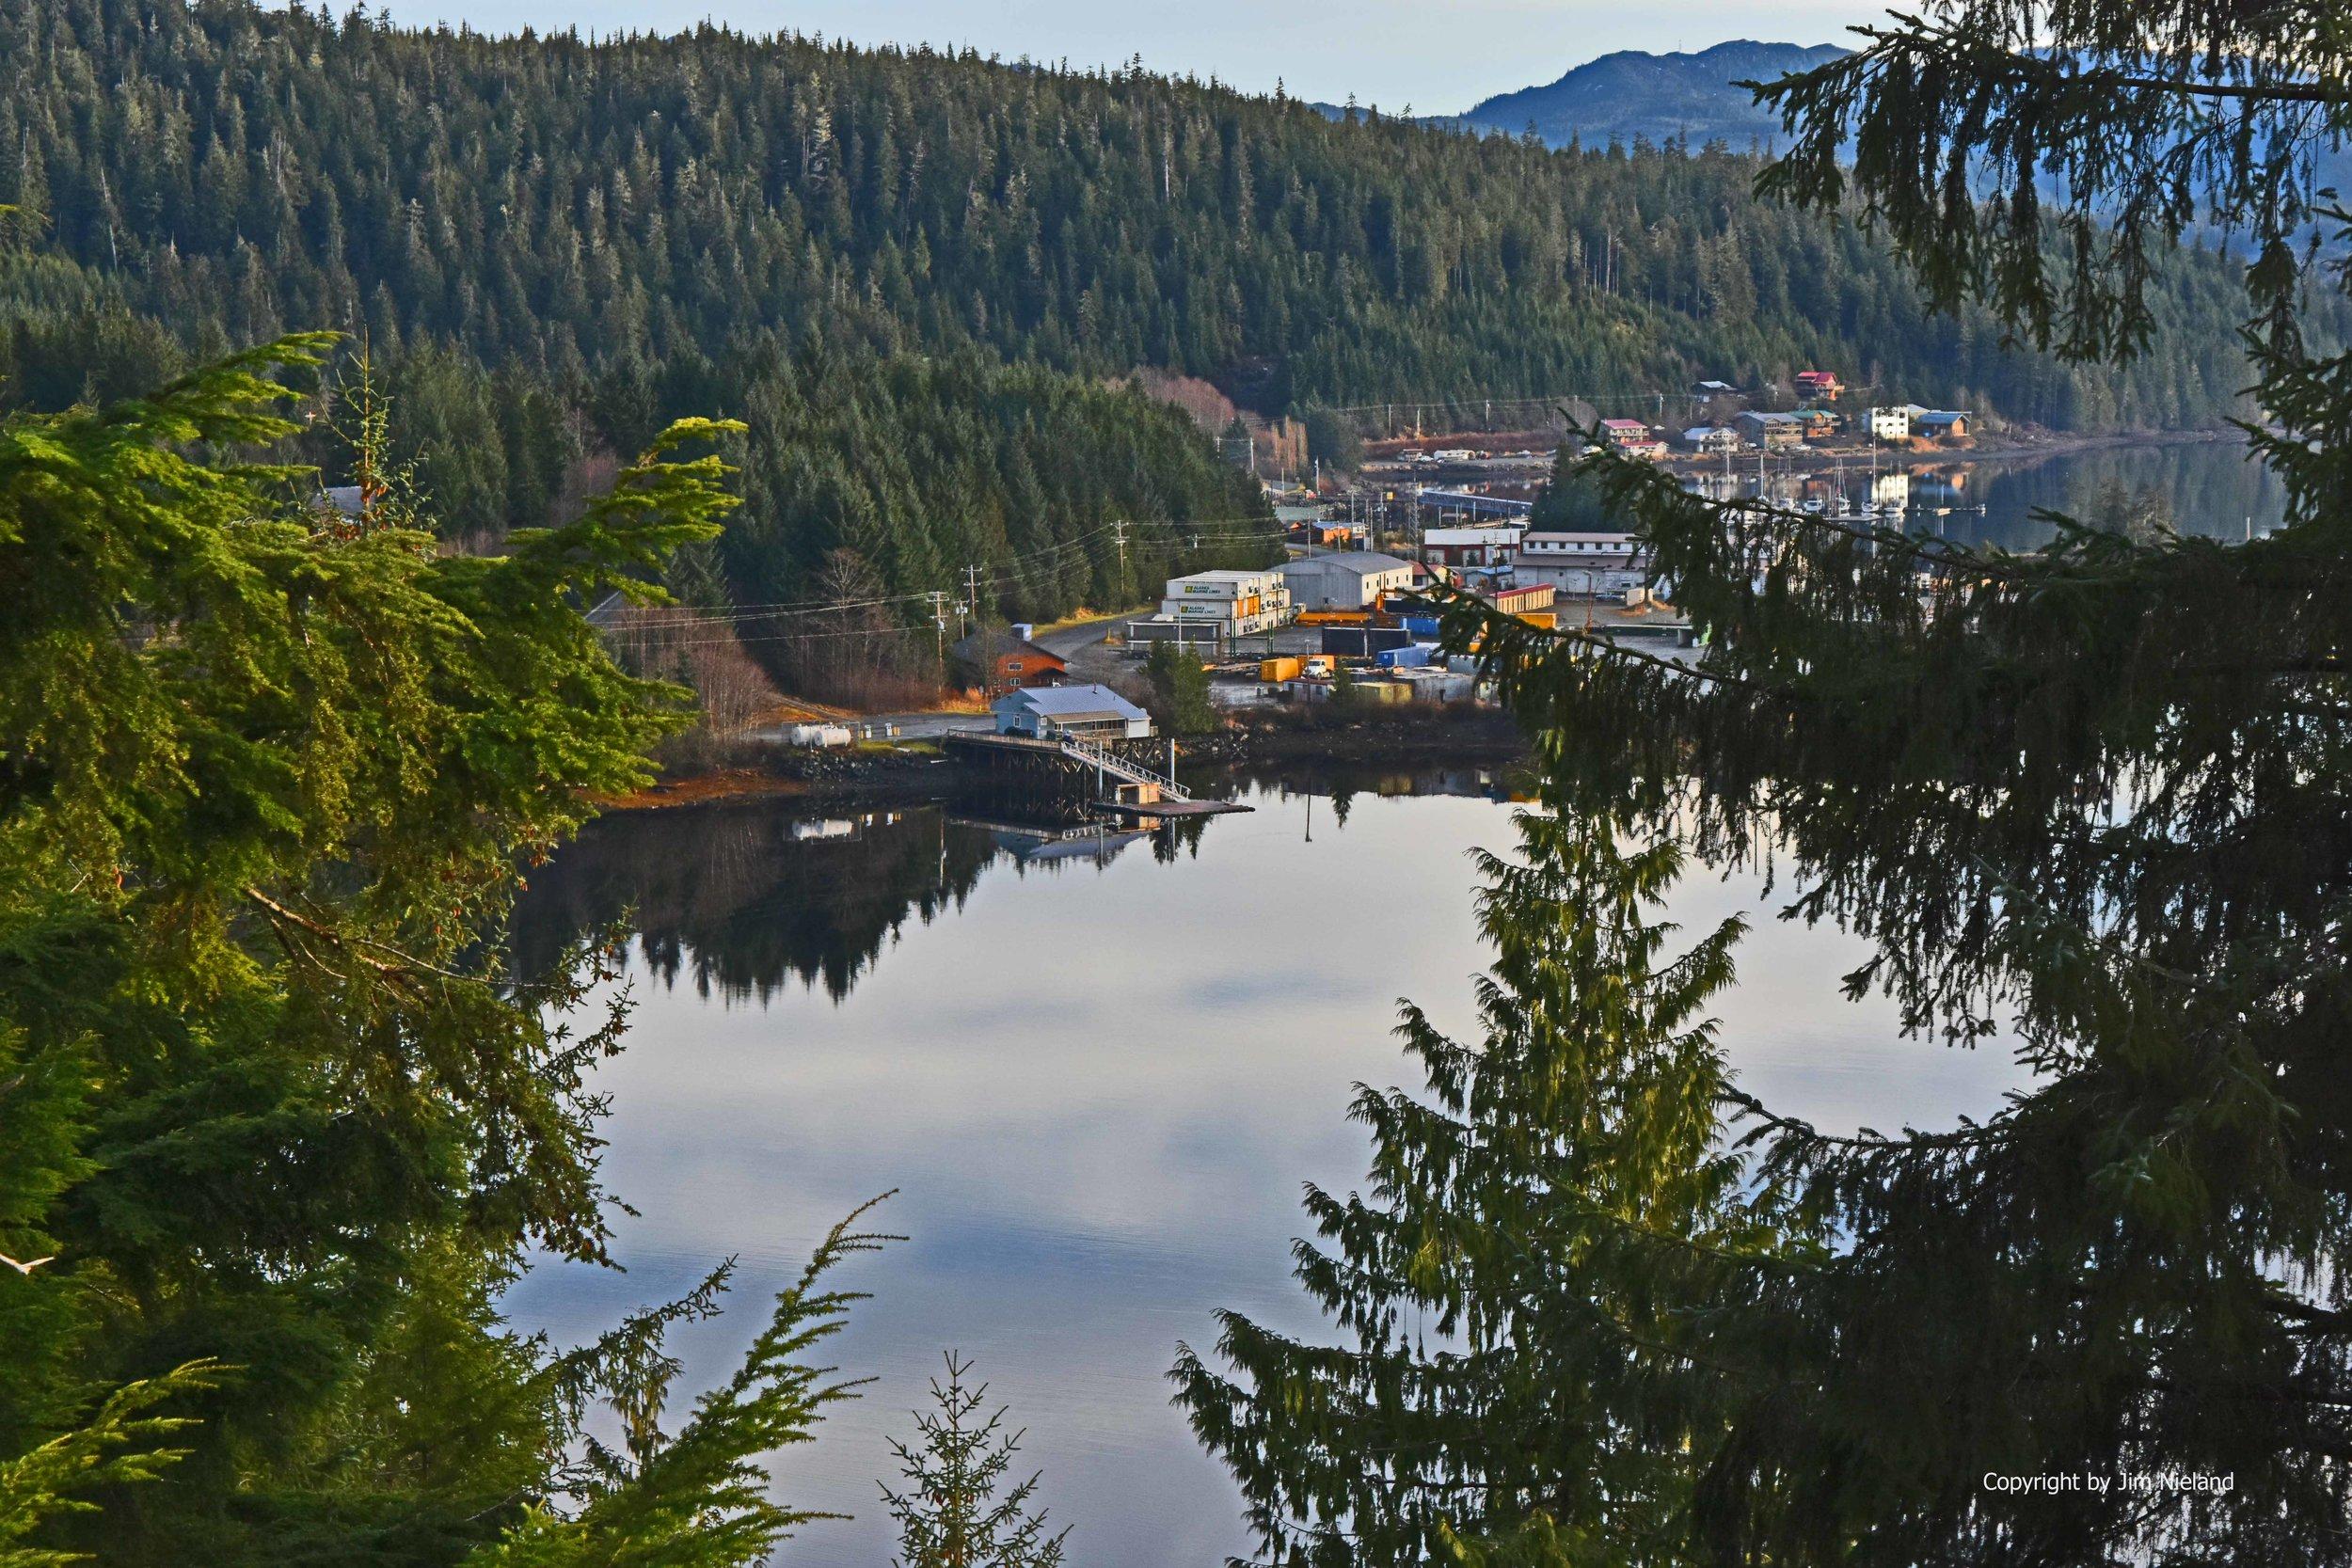 Travel and visit Thorne Bay Alaska on Prince of Wales Island